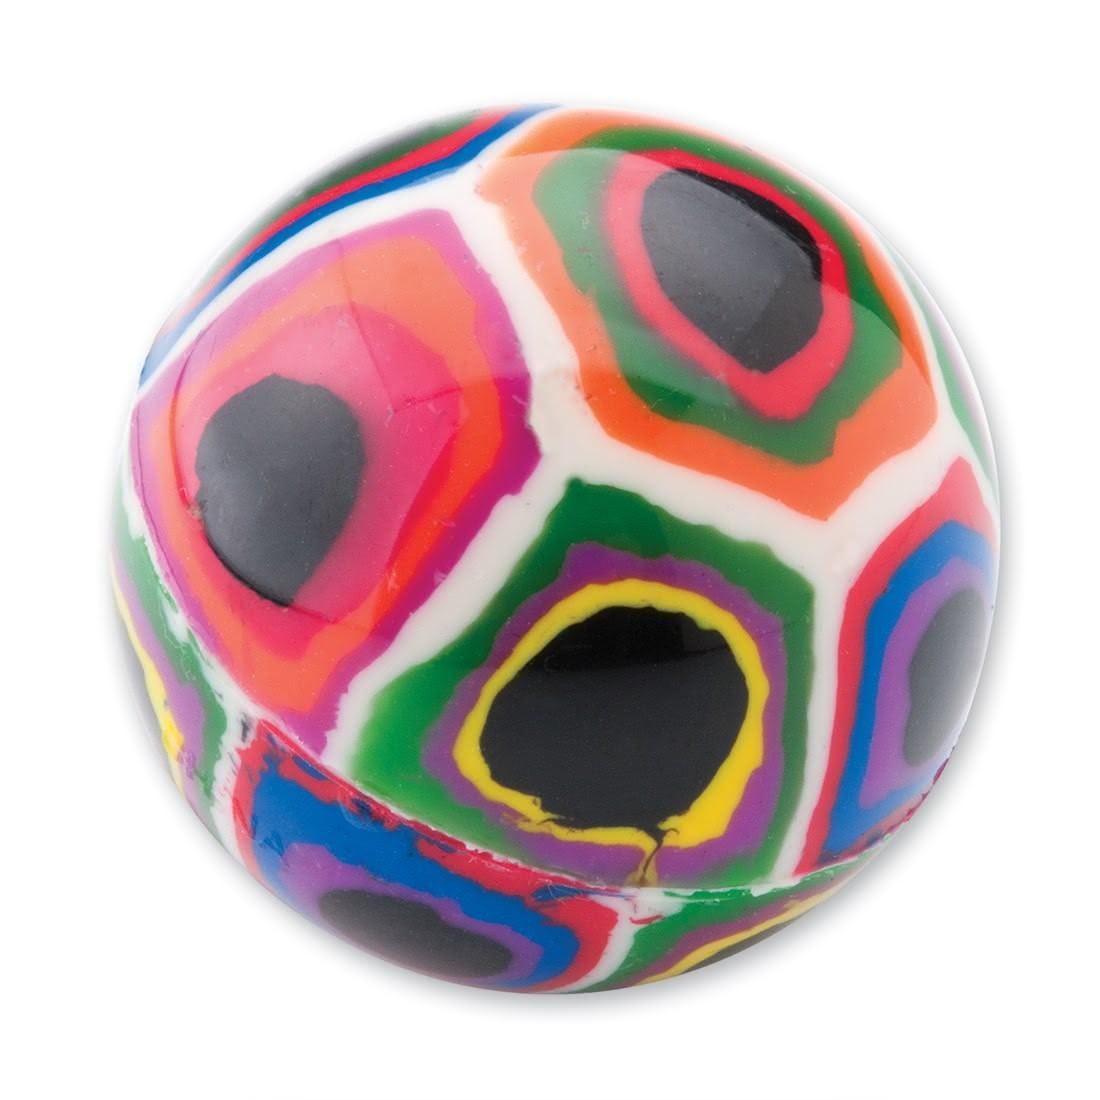 30mm Rainbow Fusion Bouncing Balls [image]